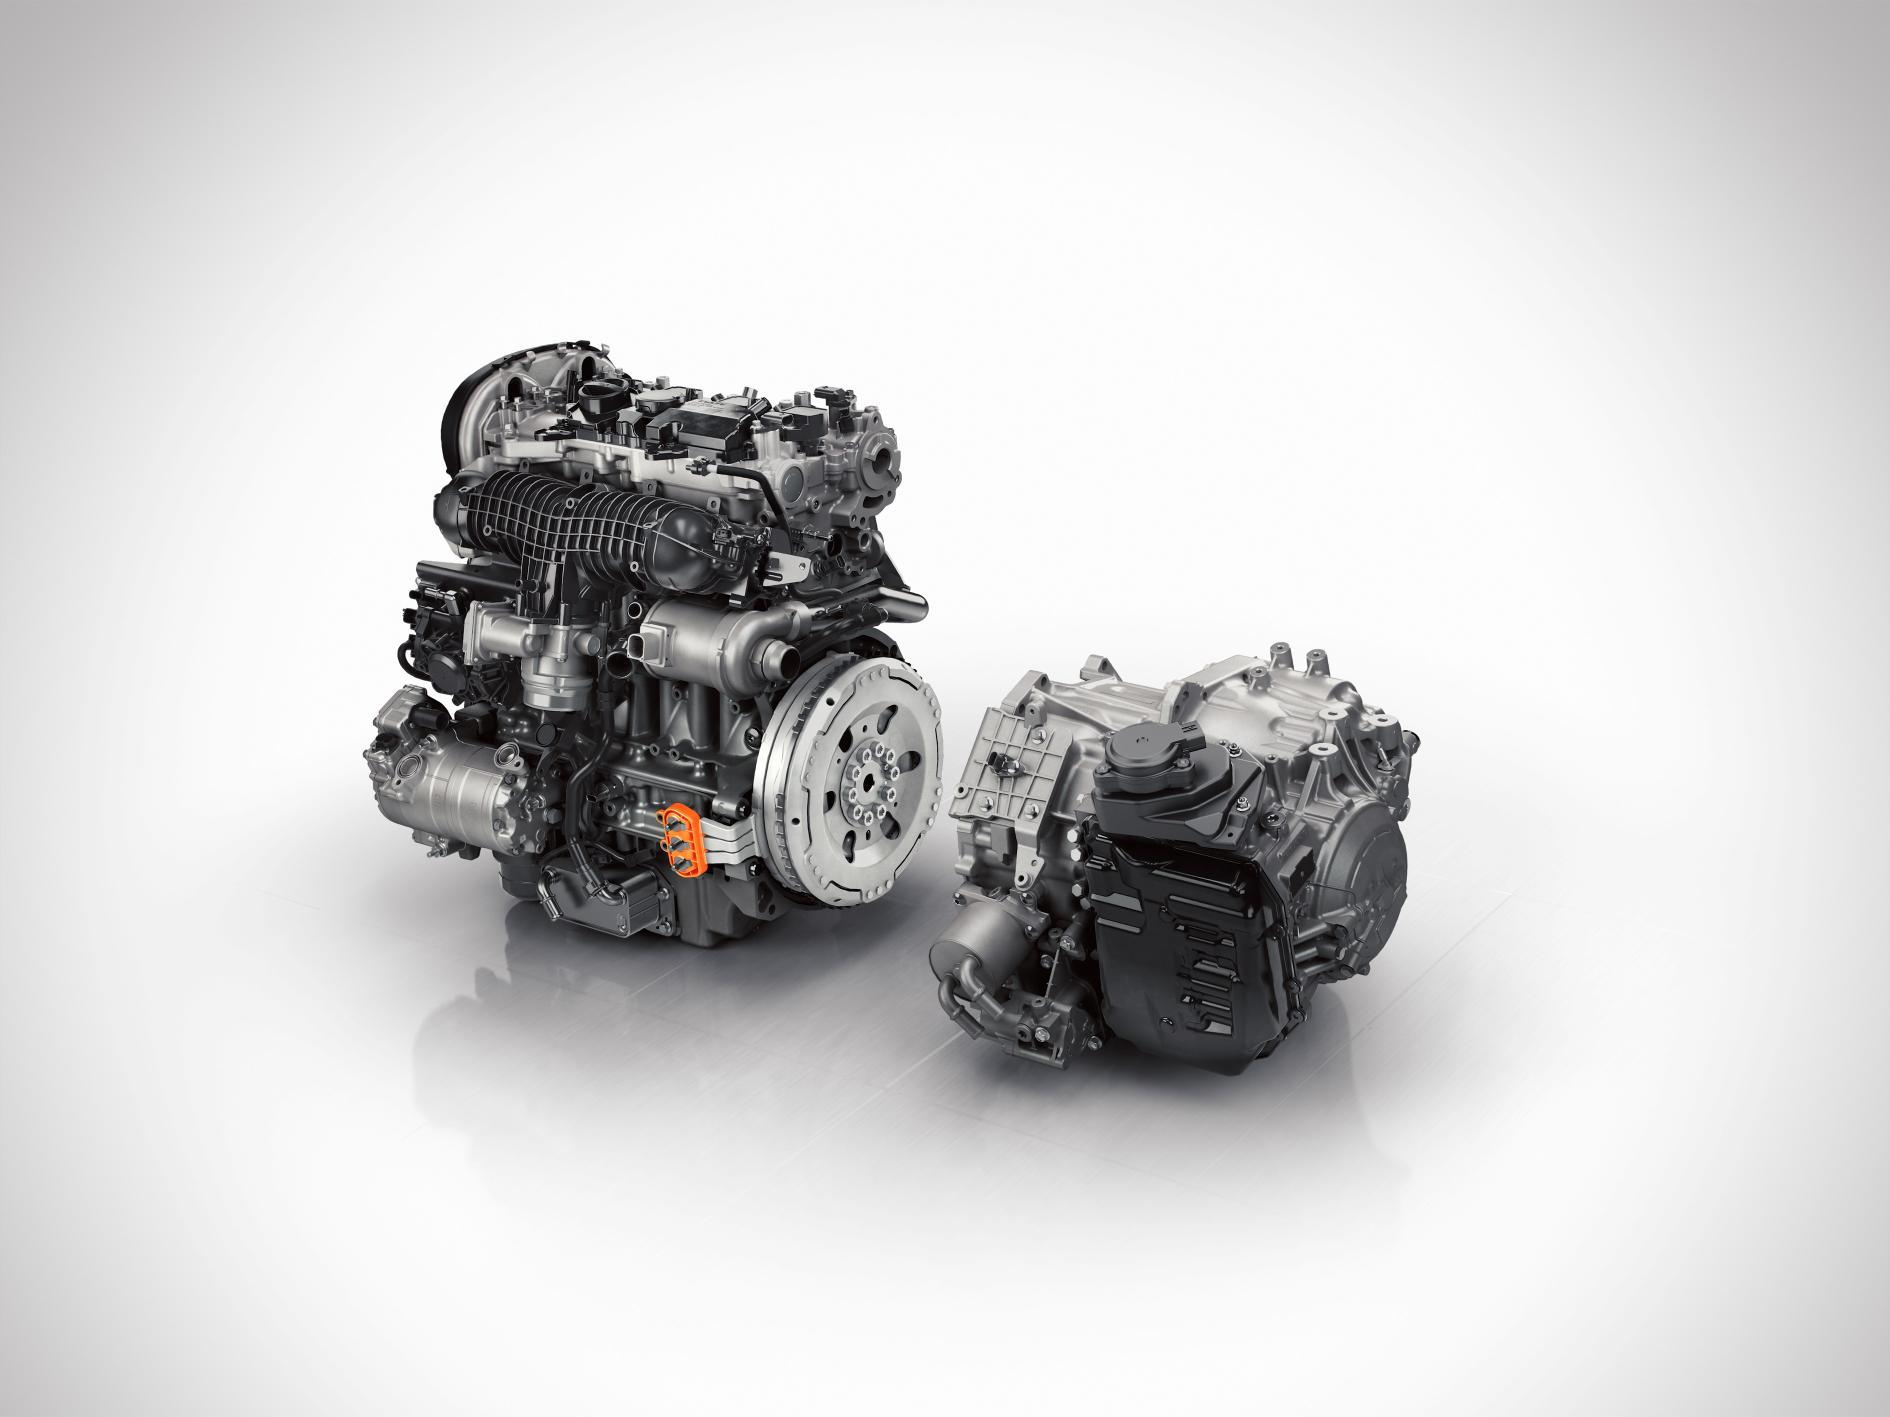 New Volvo Xc90 >> 2015 Volvo XC90 T8 Twin Engine Plug-In Hybrid Variant ...